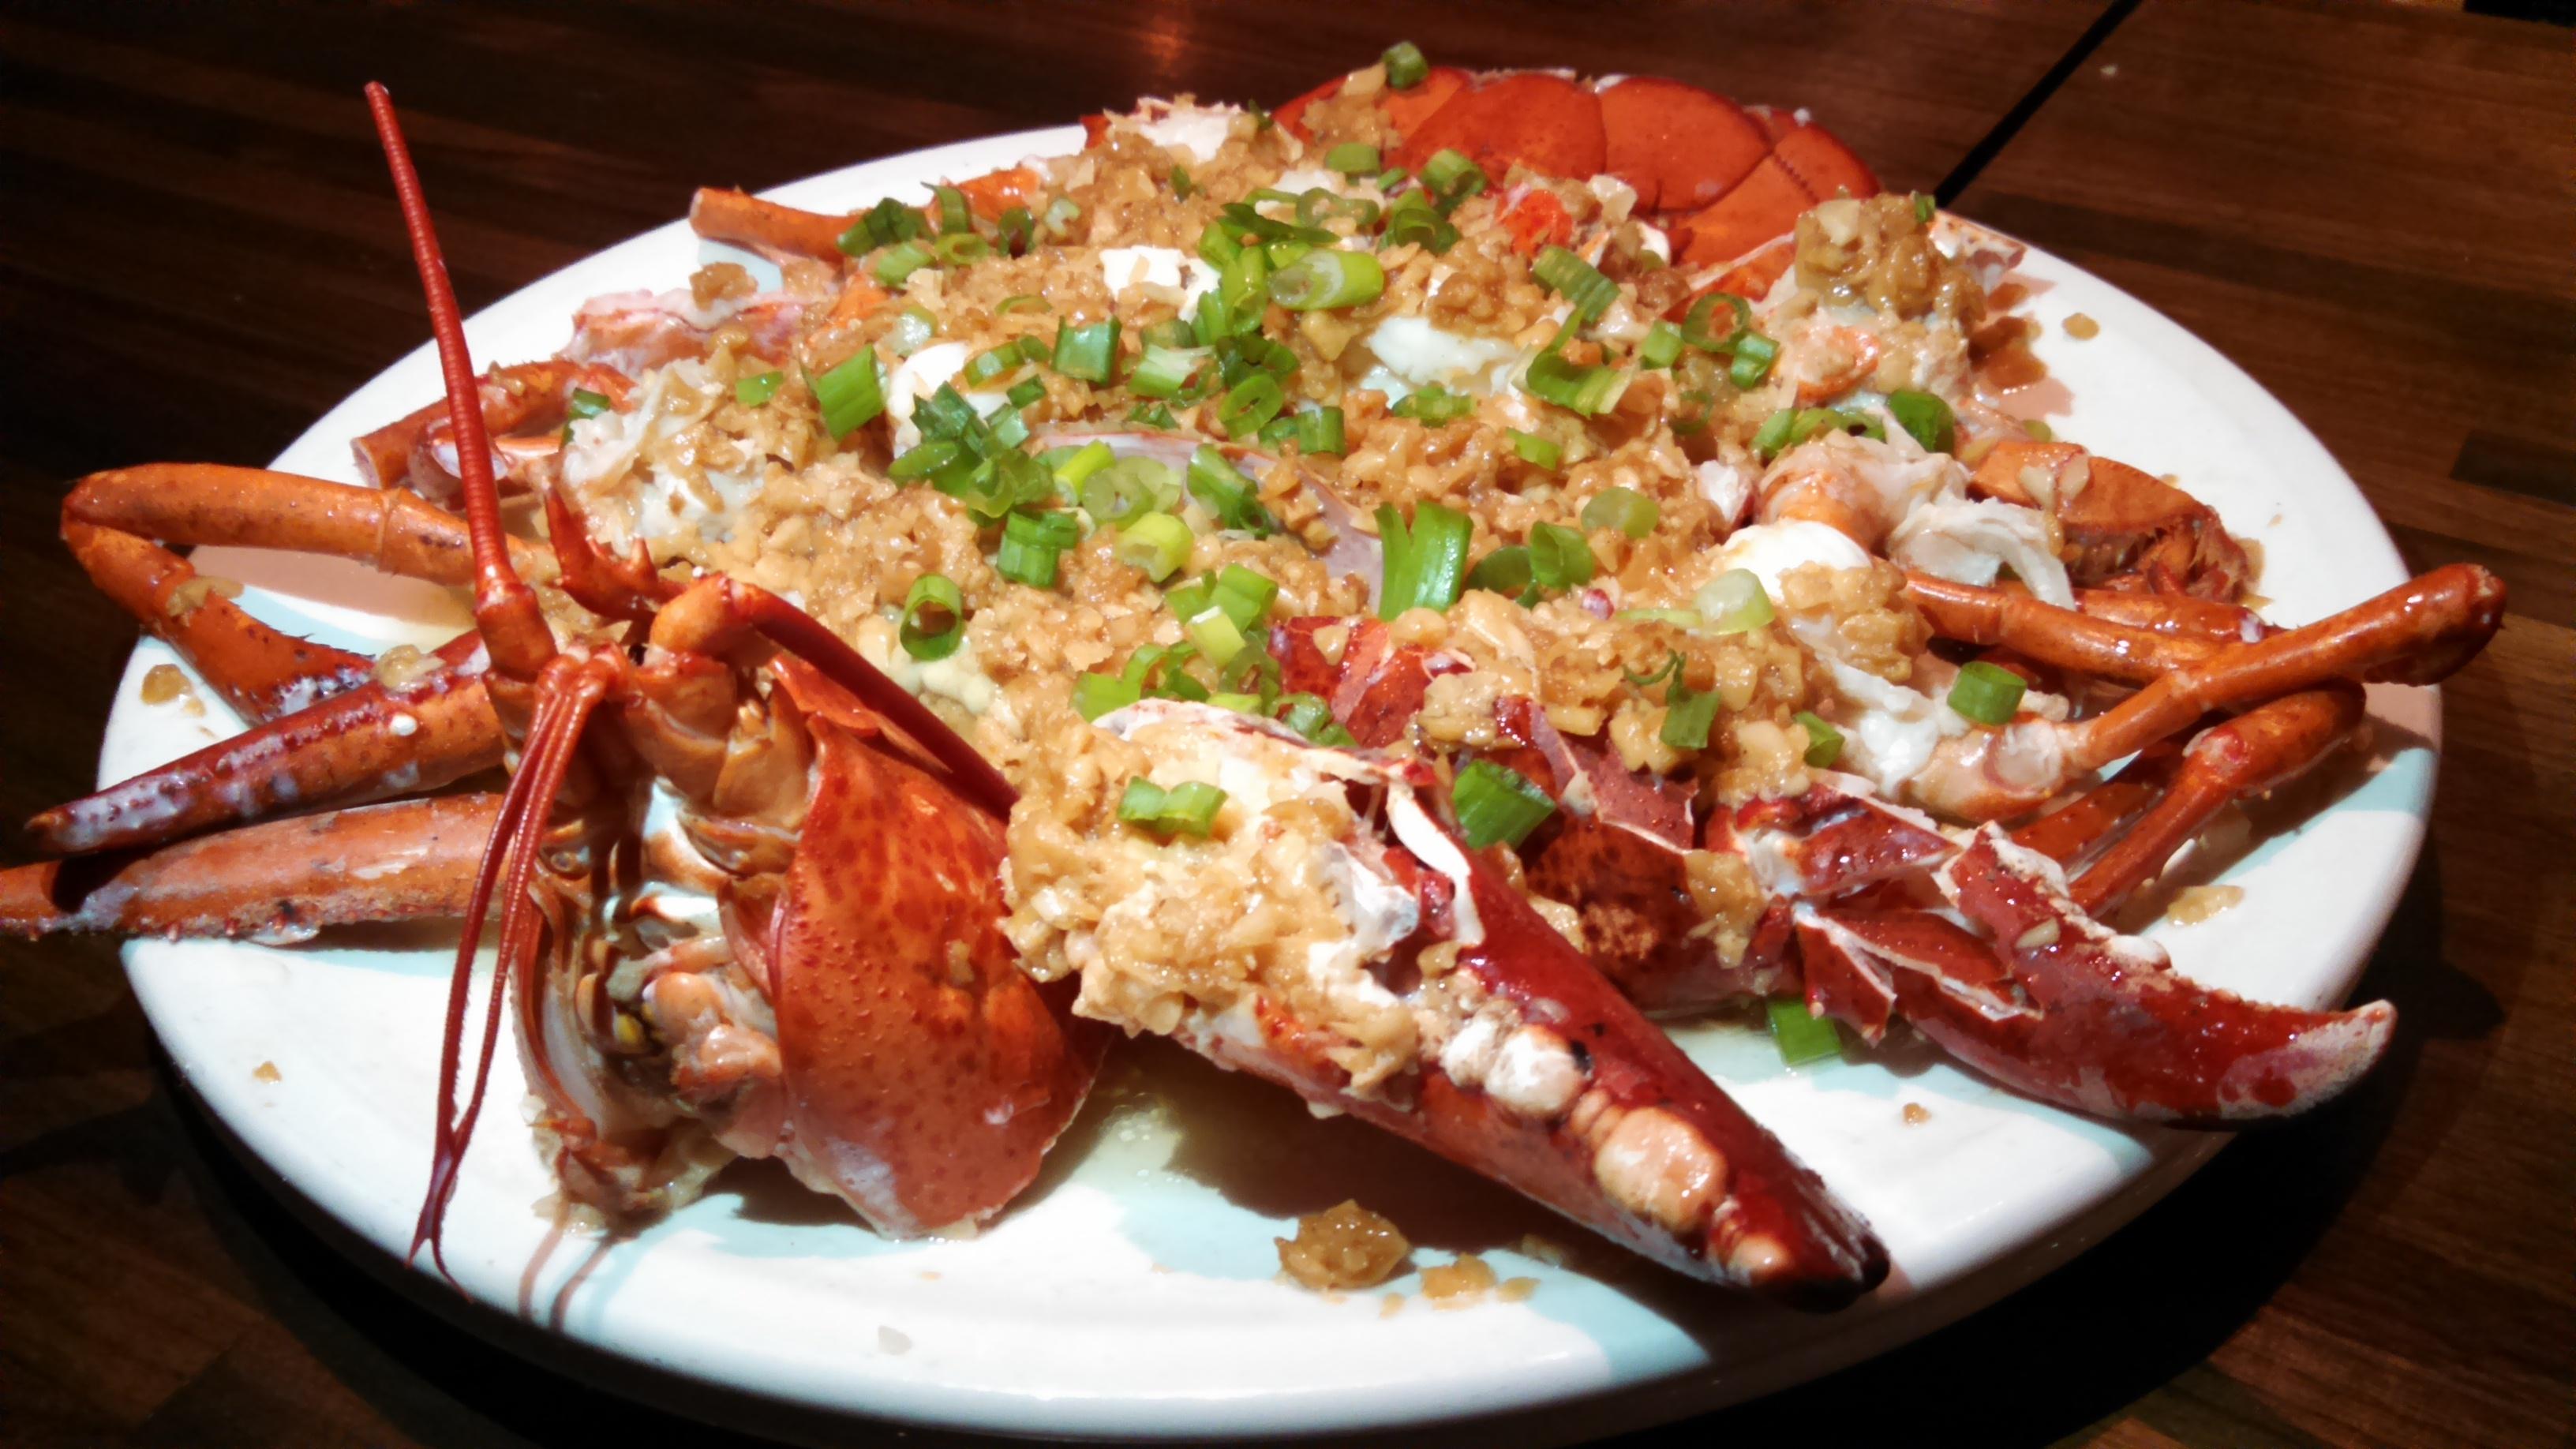 MYChina steamed garlic lobster